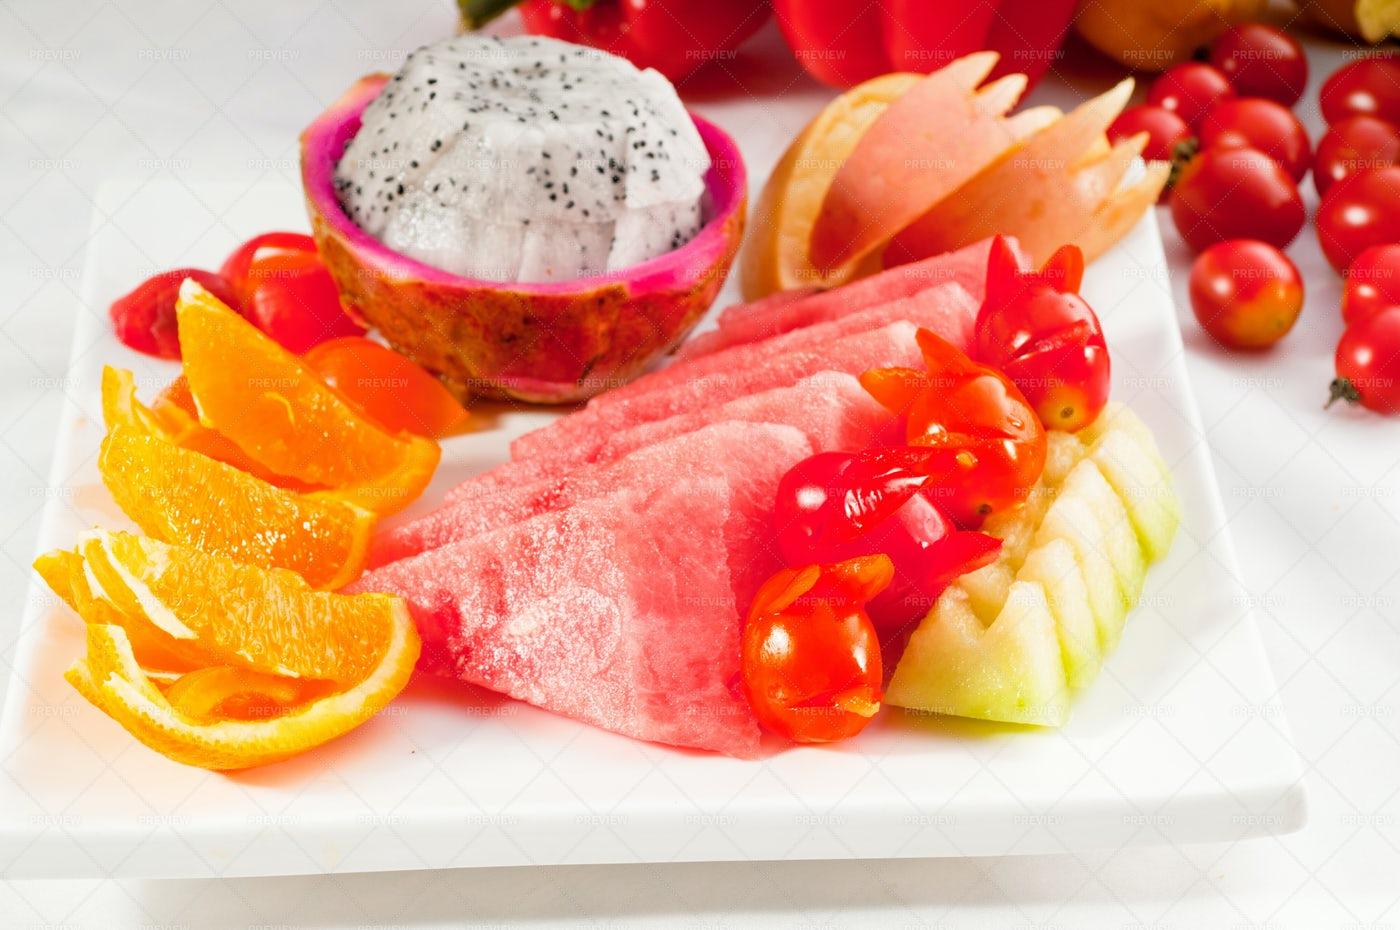 Mixed Plate Of  Fruits: Stock Photos